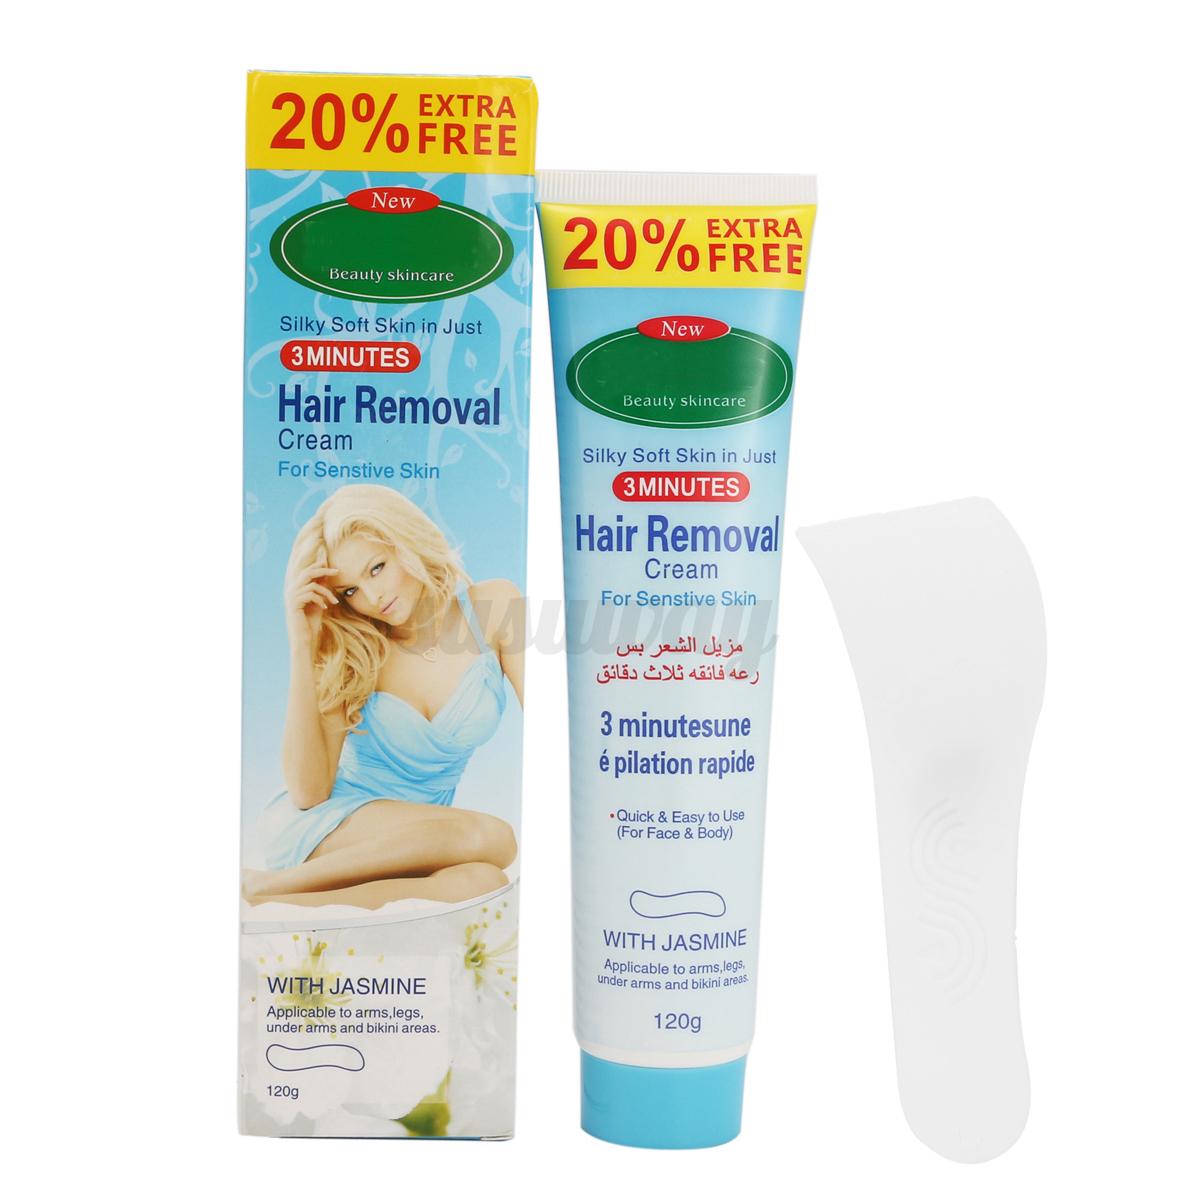 3x Unisex Herbal Permanent Hair Removal Cream Stop Hair